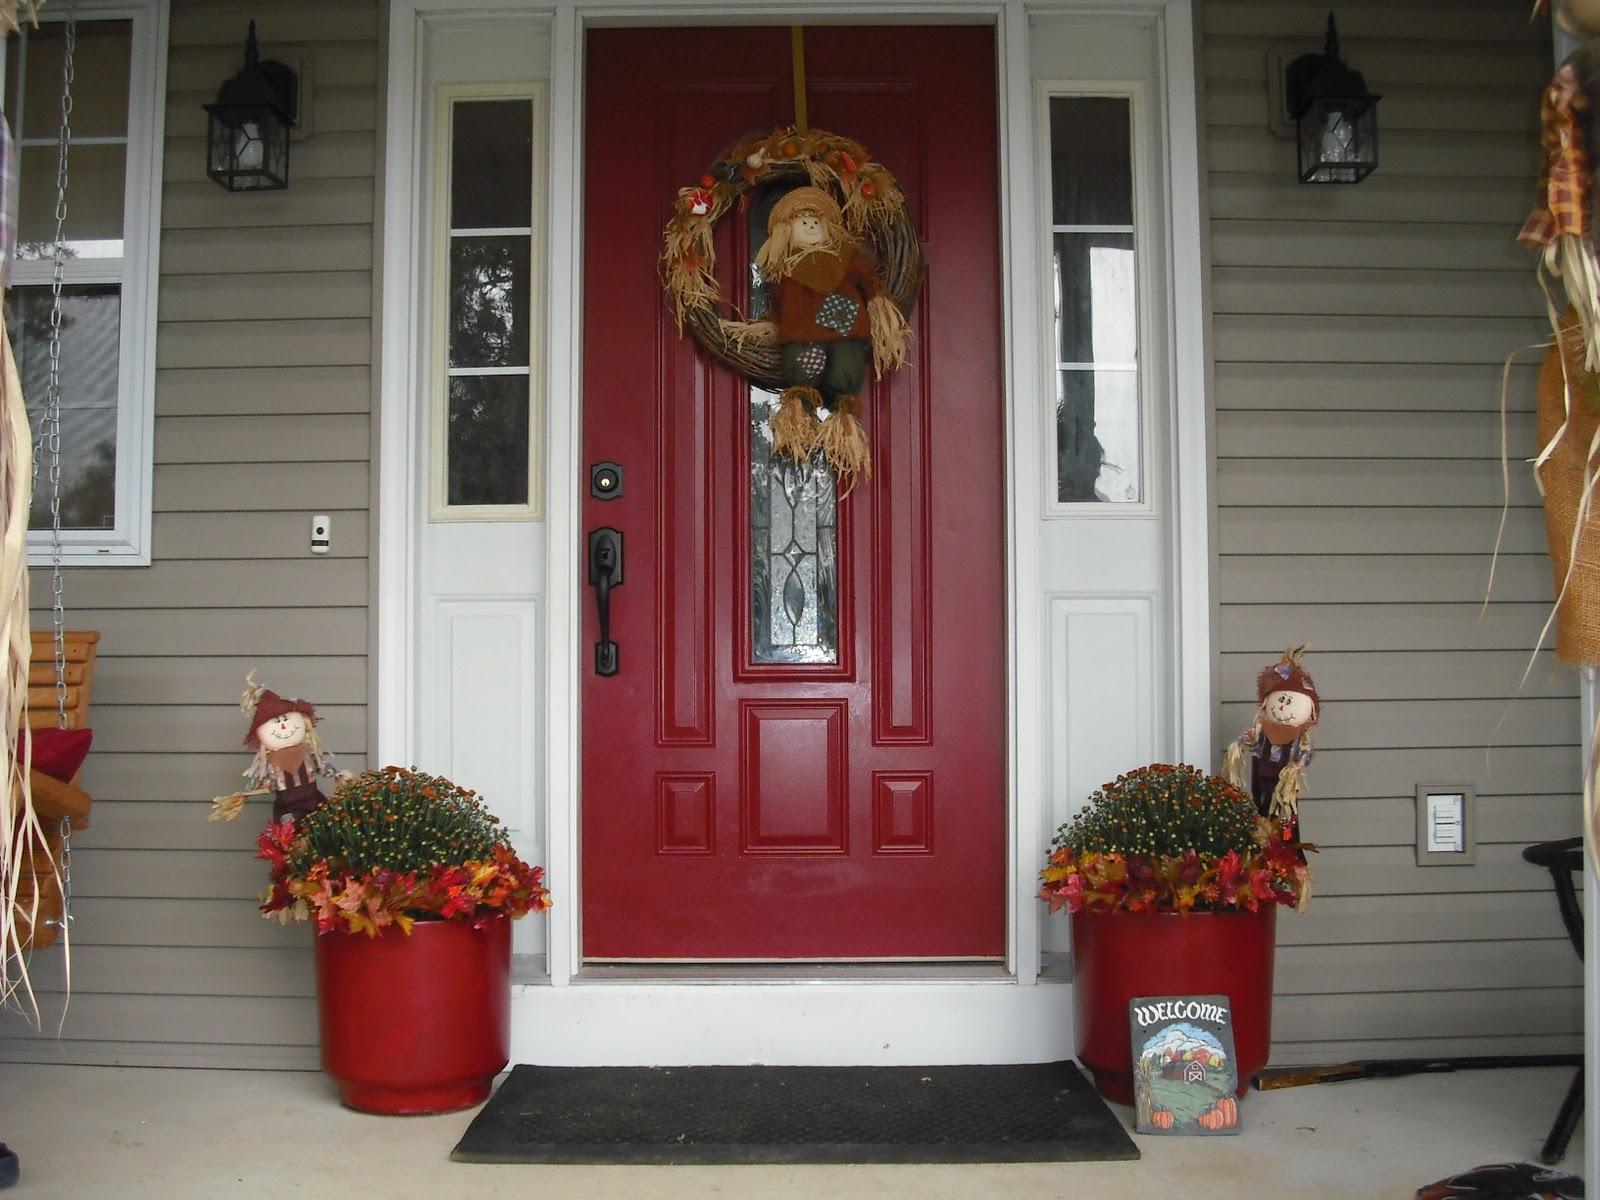 Red front door brown house - Front Door Color Red Noticeable And Vibrant Download